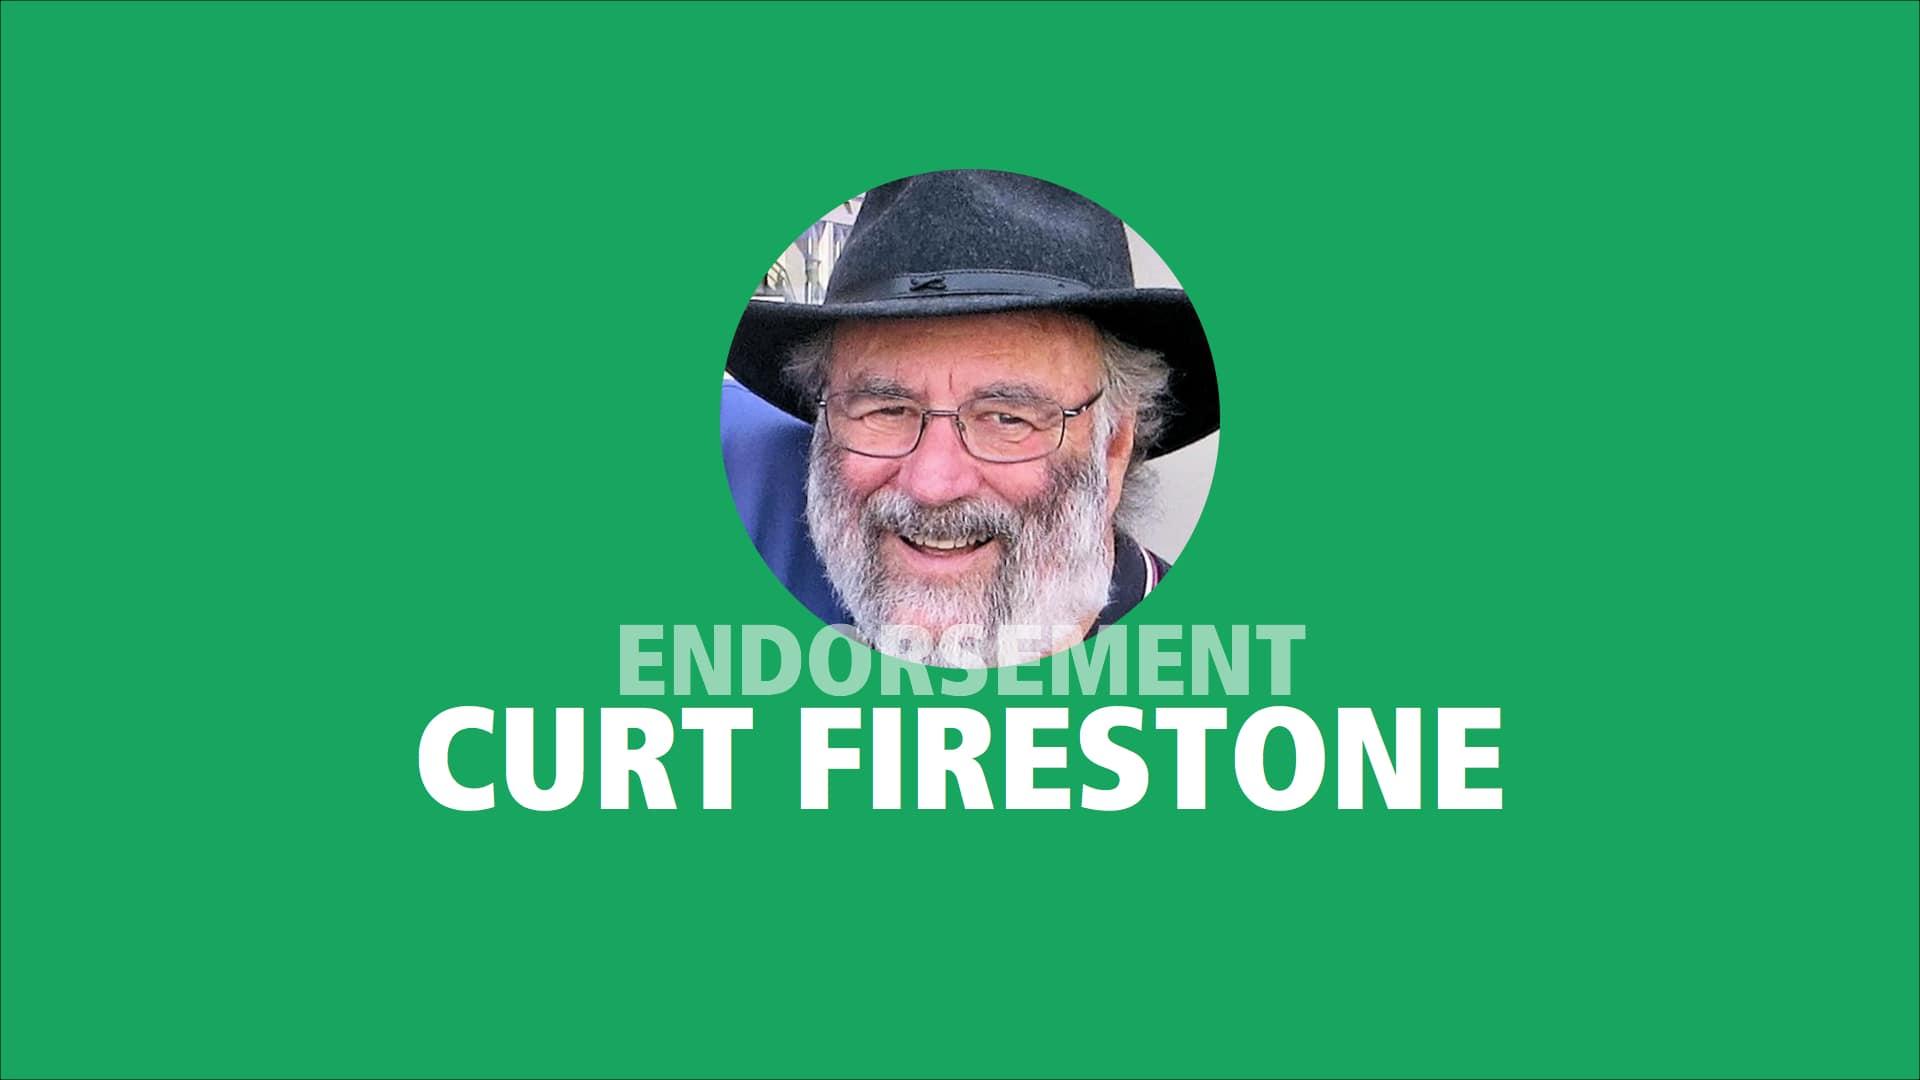 Curt Firestone endorses Adam Olsen